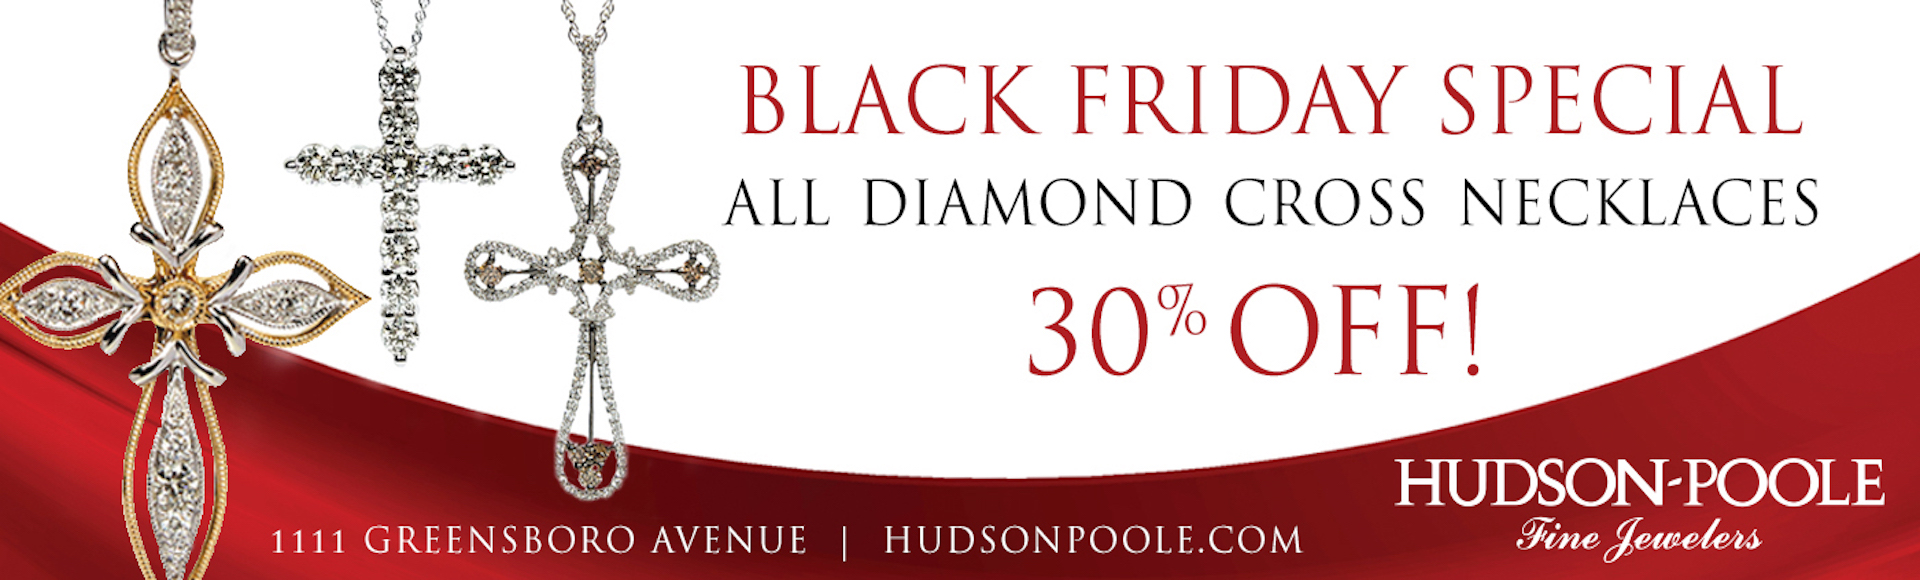 Black Friday Special - Cross Necklaces